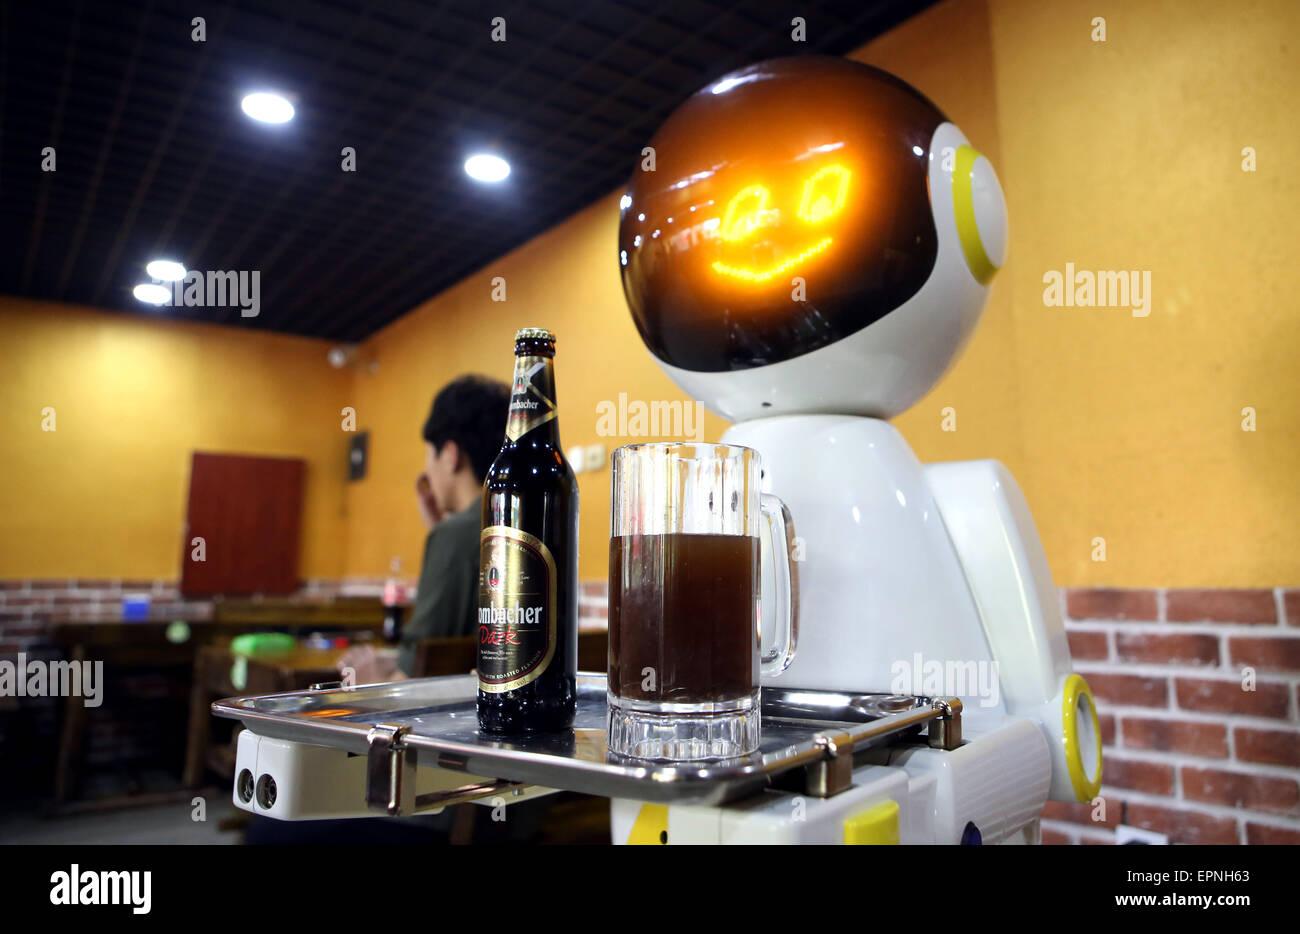 Shenyang, China Liaoning Provinz. 20. Mai 2015. Ein Roboter serviert Bier in einem Restaurant in Shenyang, Hauptstadt Stockbild